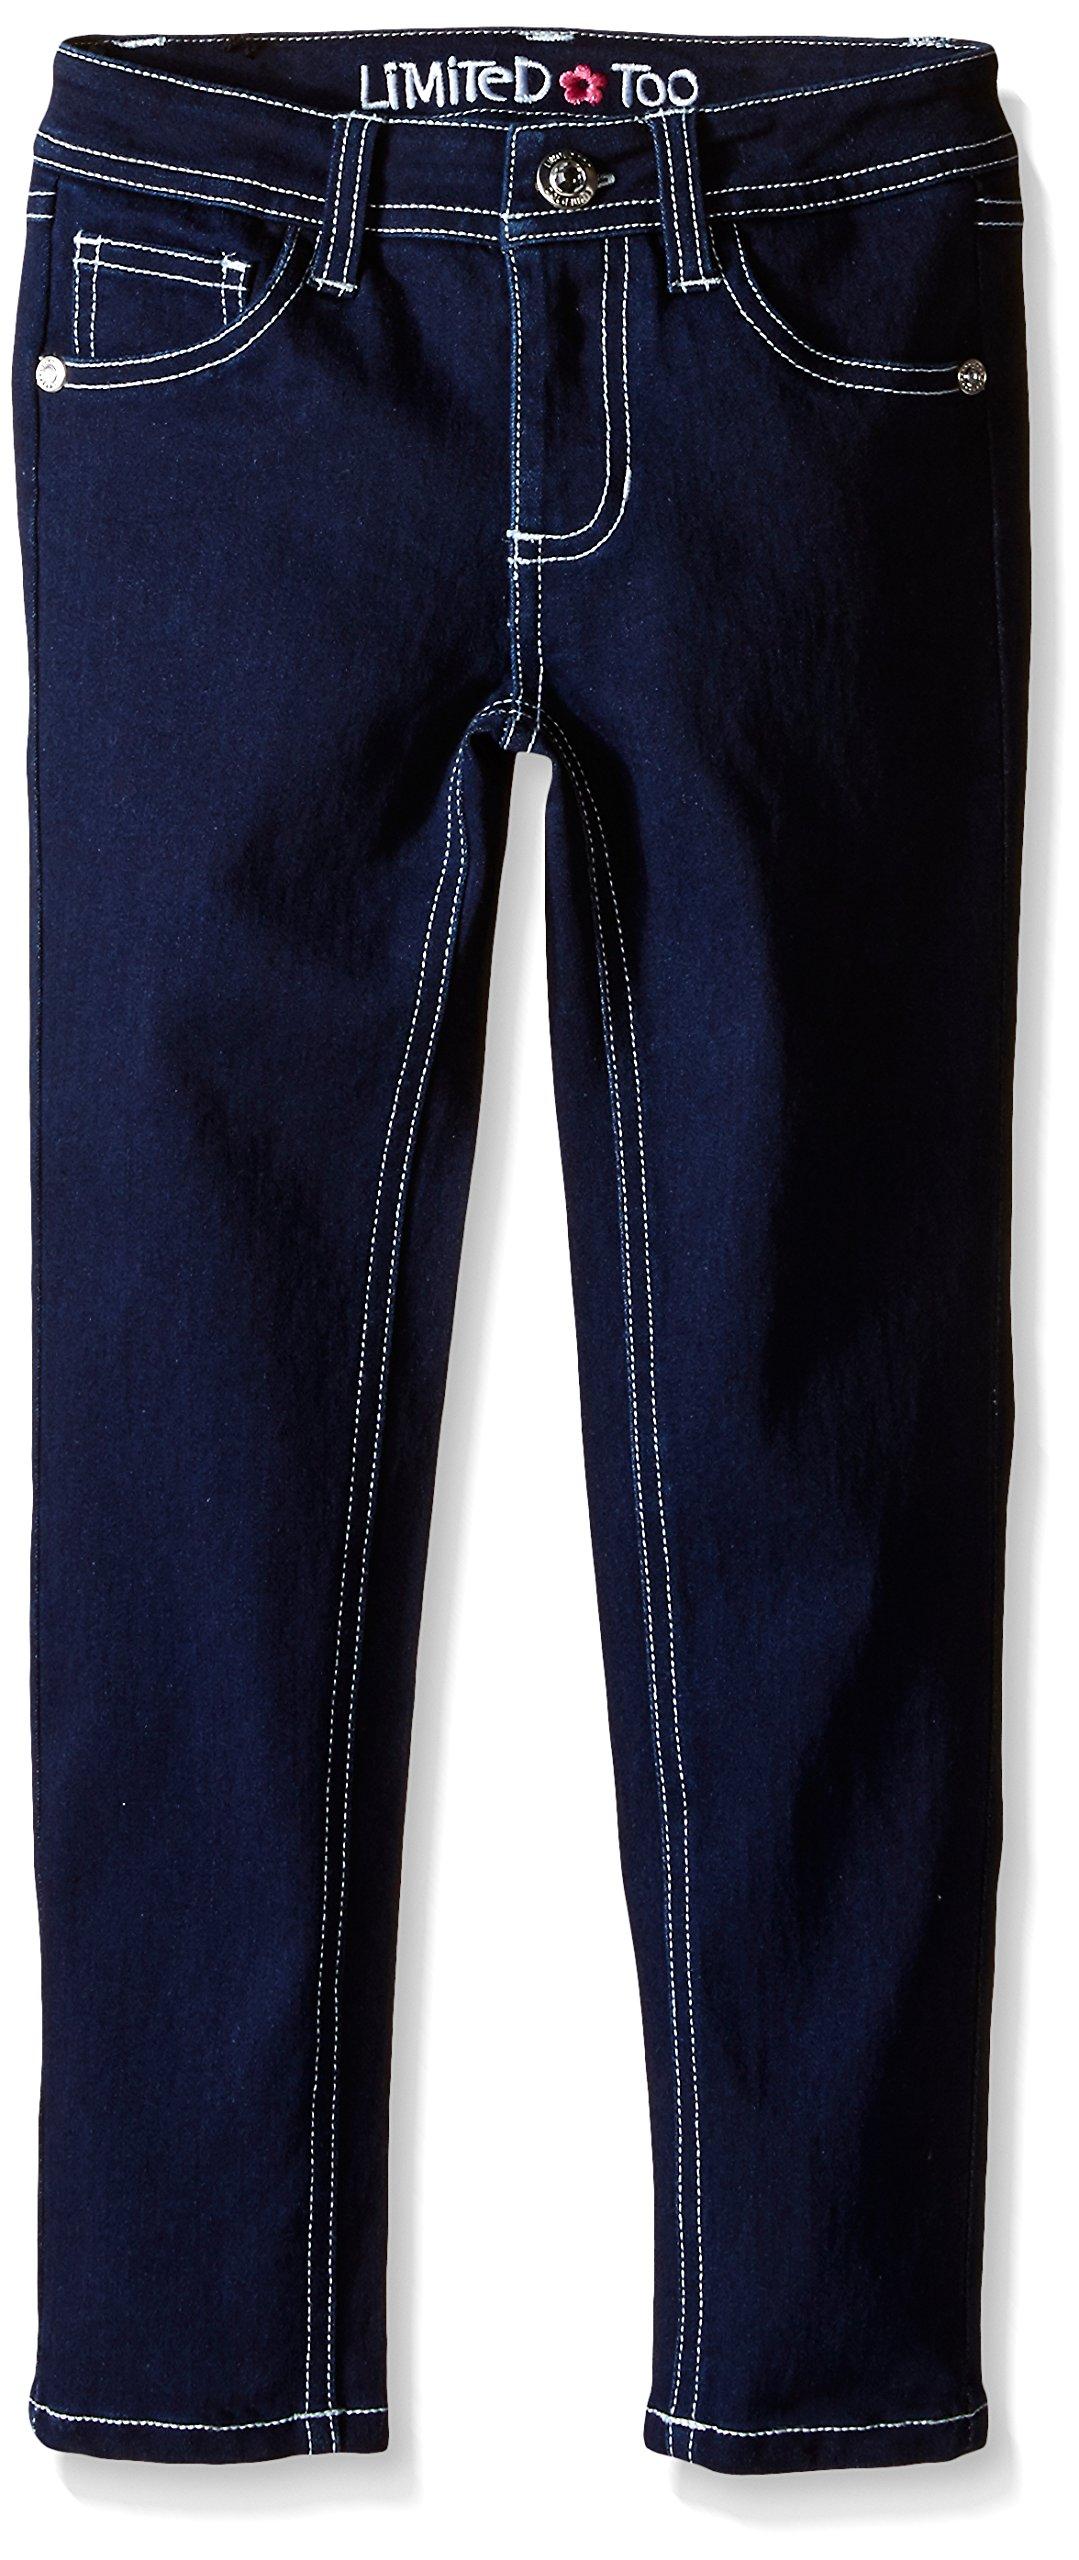 Limited Too Big Girls' Stretch Denim Jean, Dark Wash, 10 by Limited Too